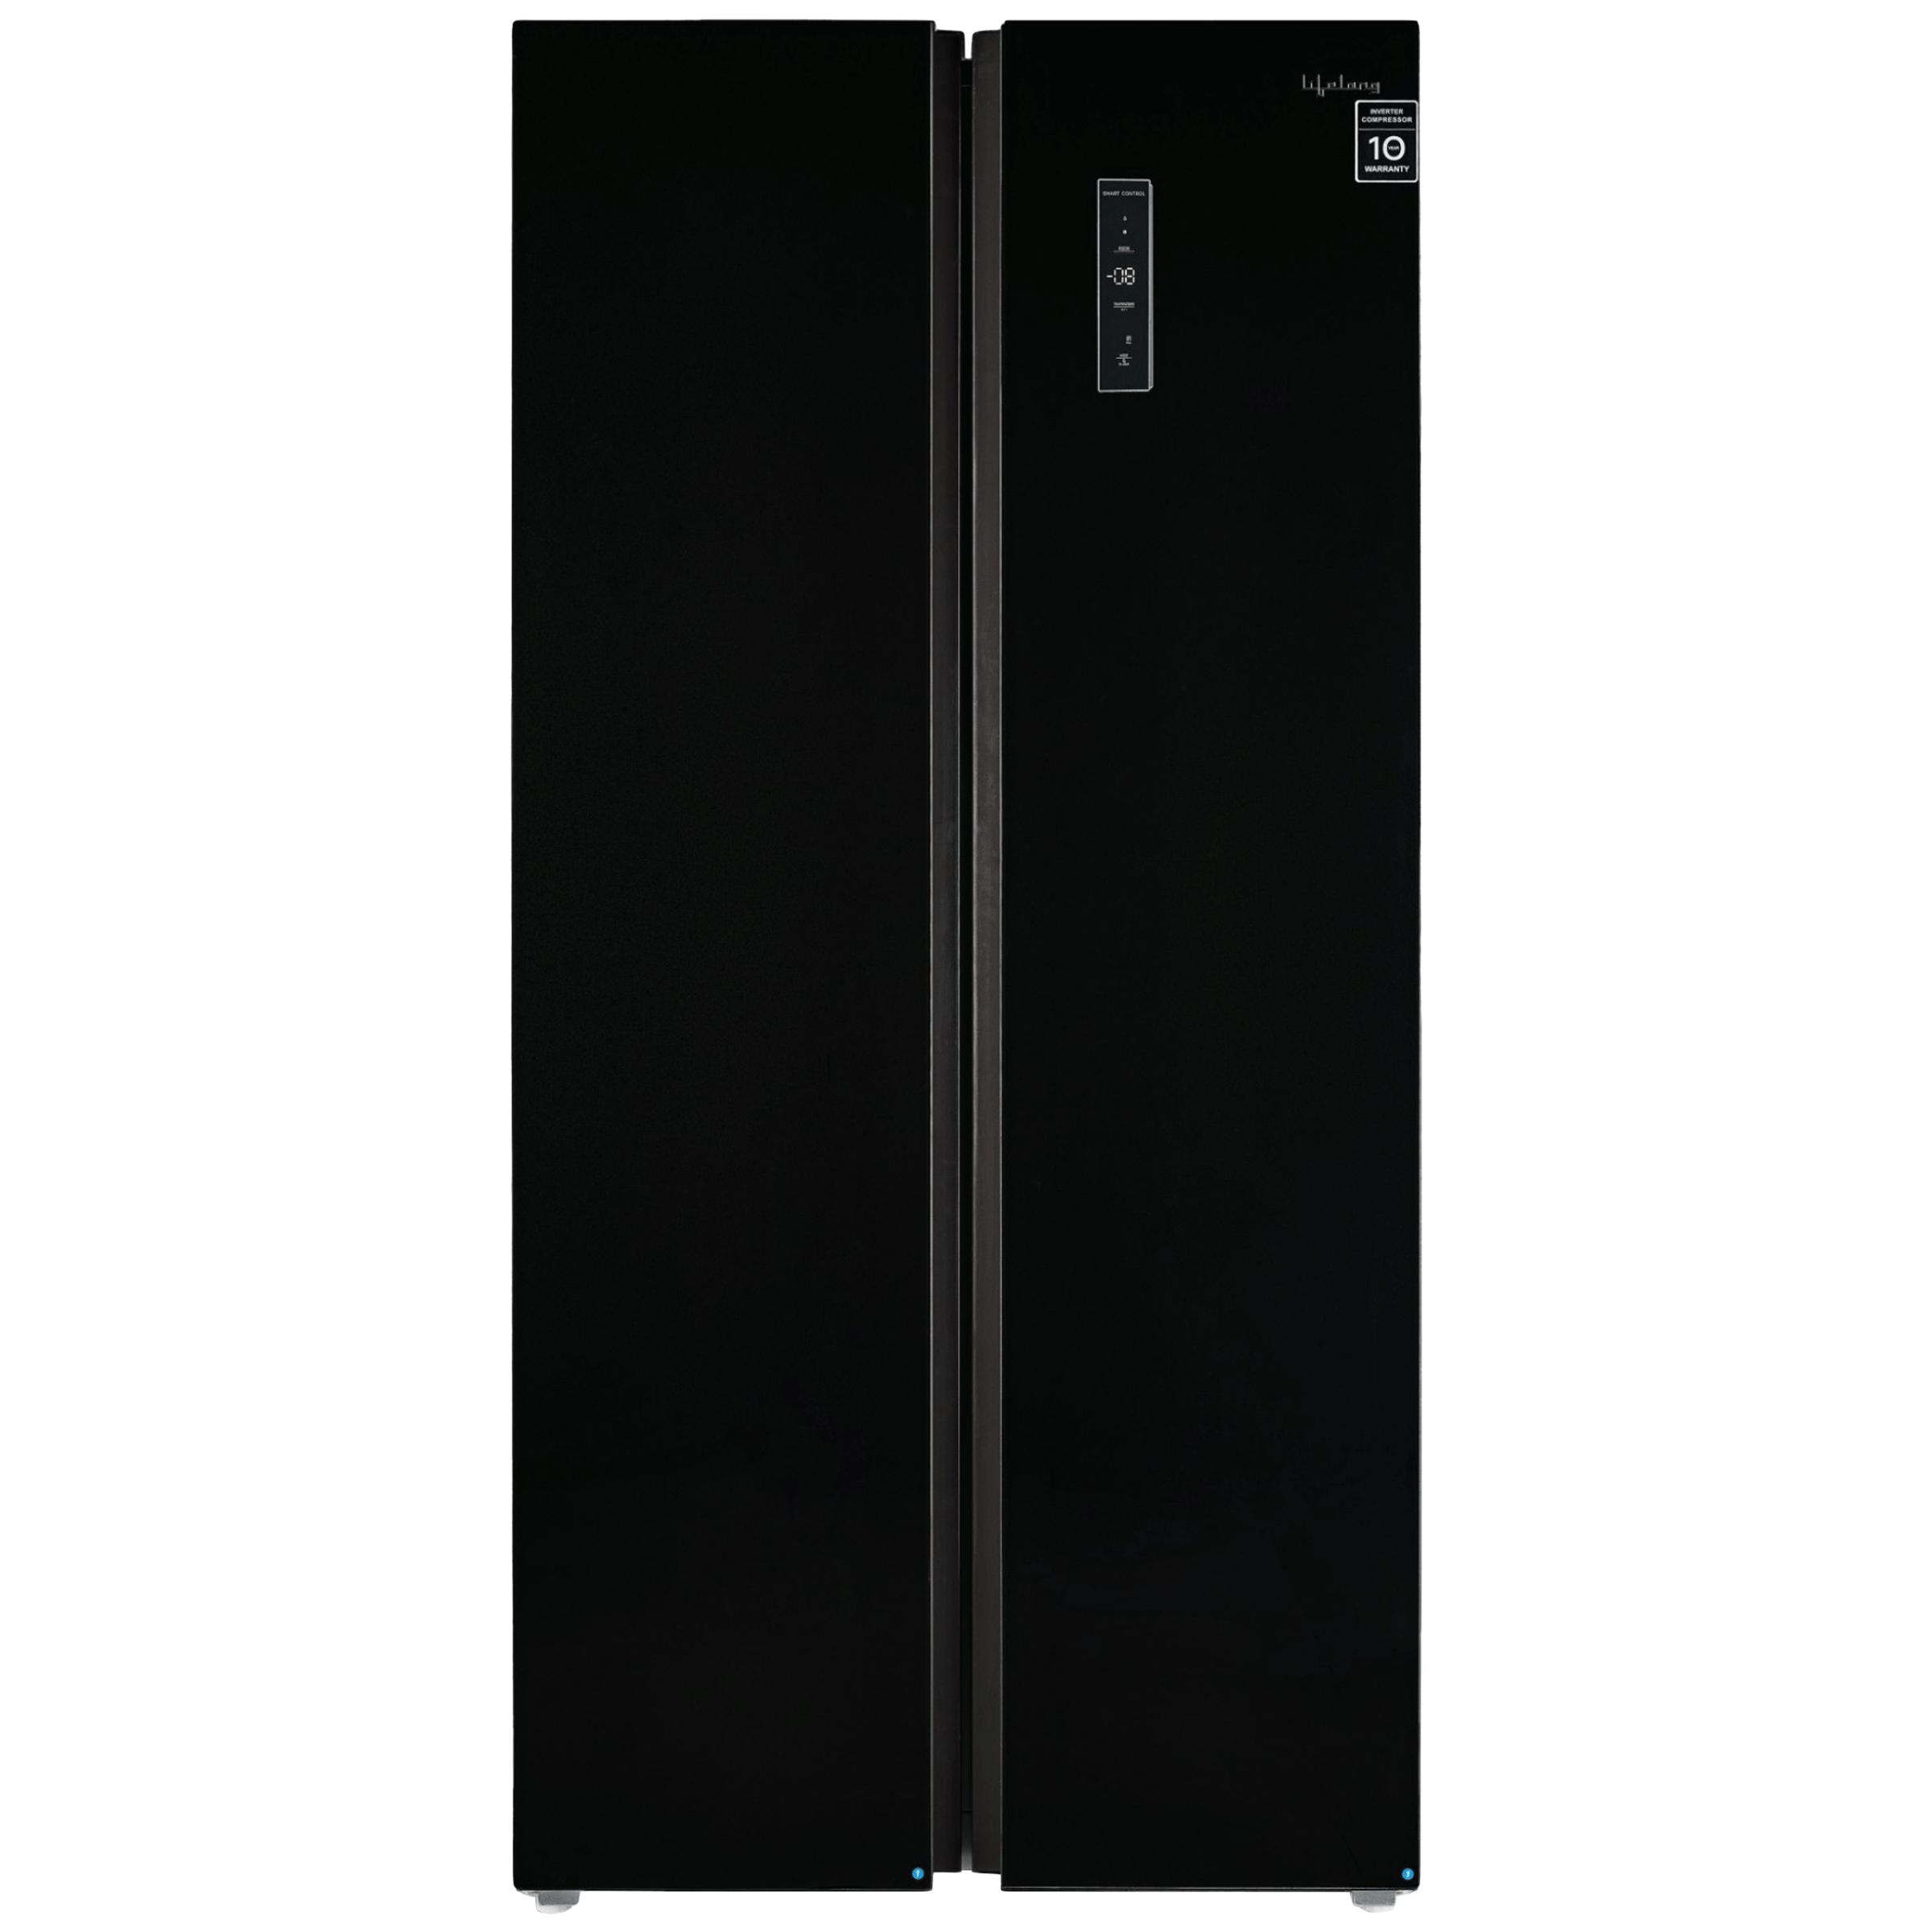 Lifelong 505 Litres Frost Free Inverter Side-by-Side Refrigerator (Quick Freeze, LLSBSR505BG, Black)_1